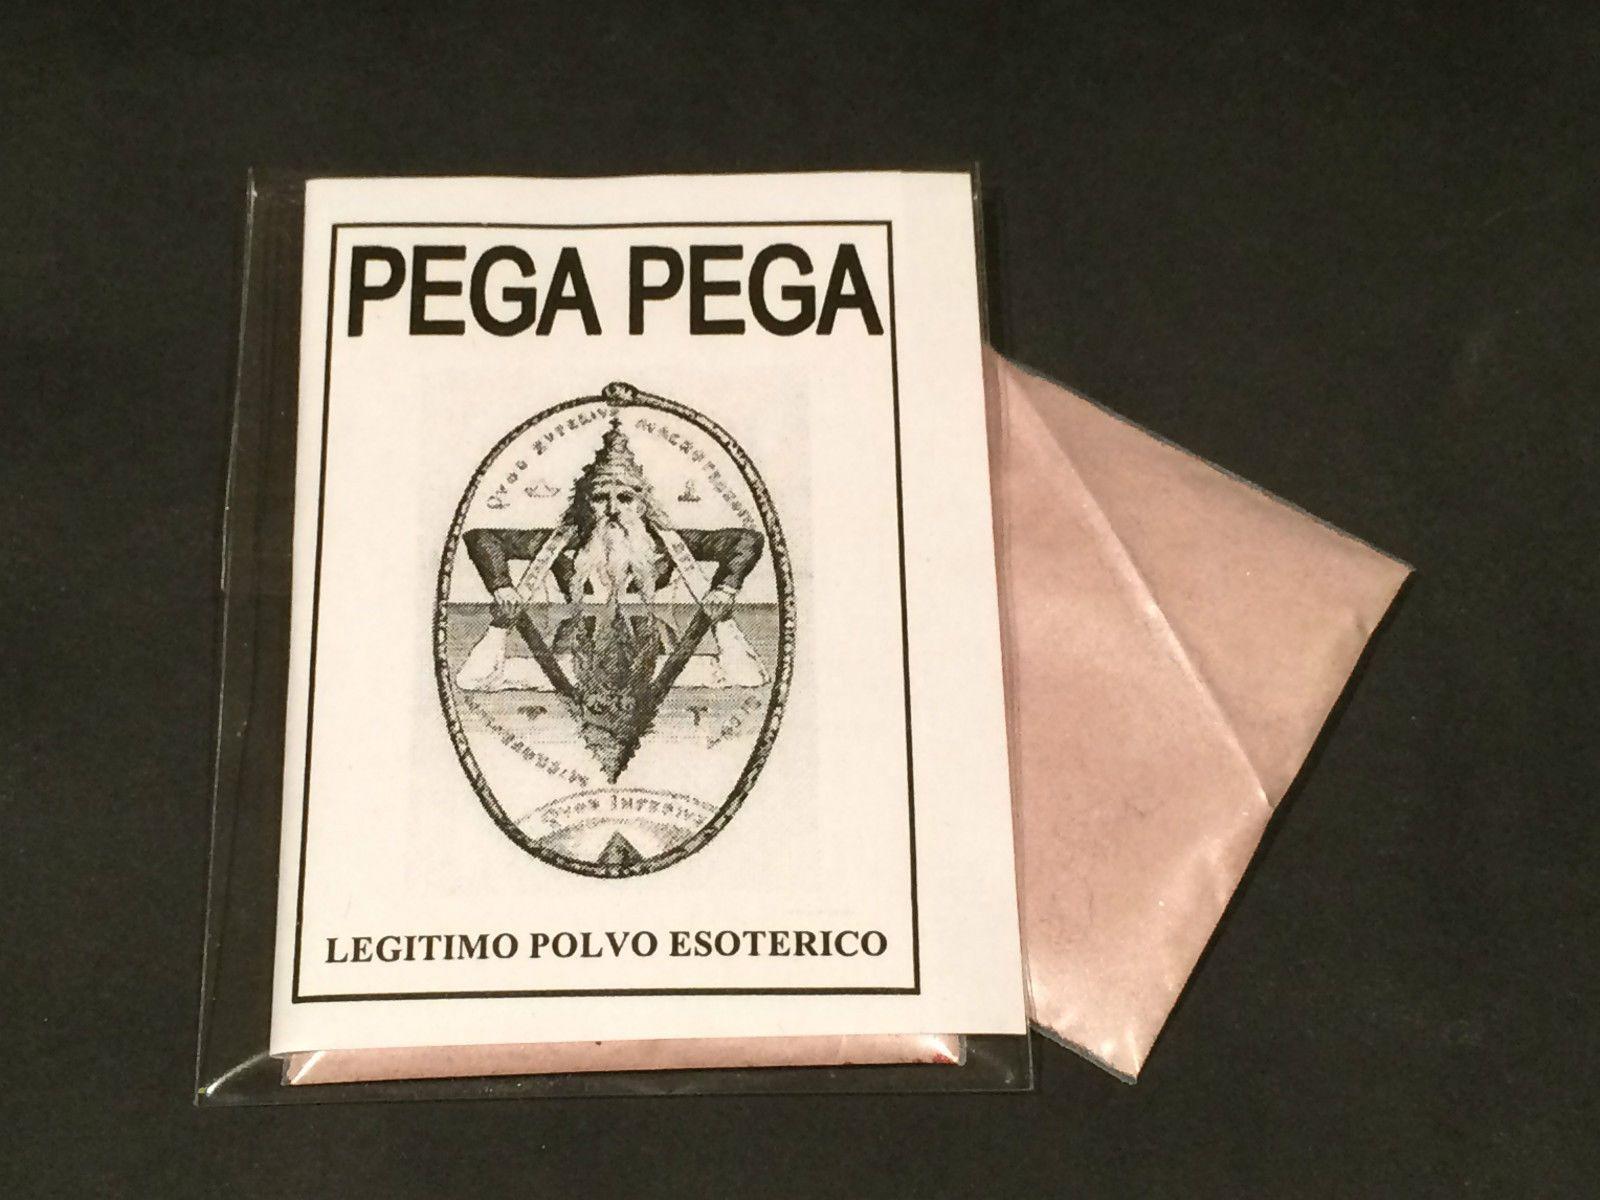 "LEGITIMO POLVO ESOTERICO ESPECIAL "" PEGA PEGA"""